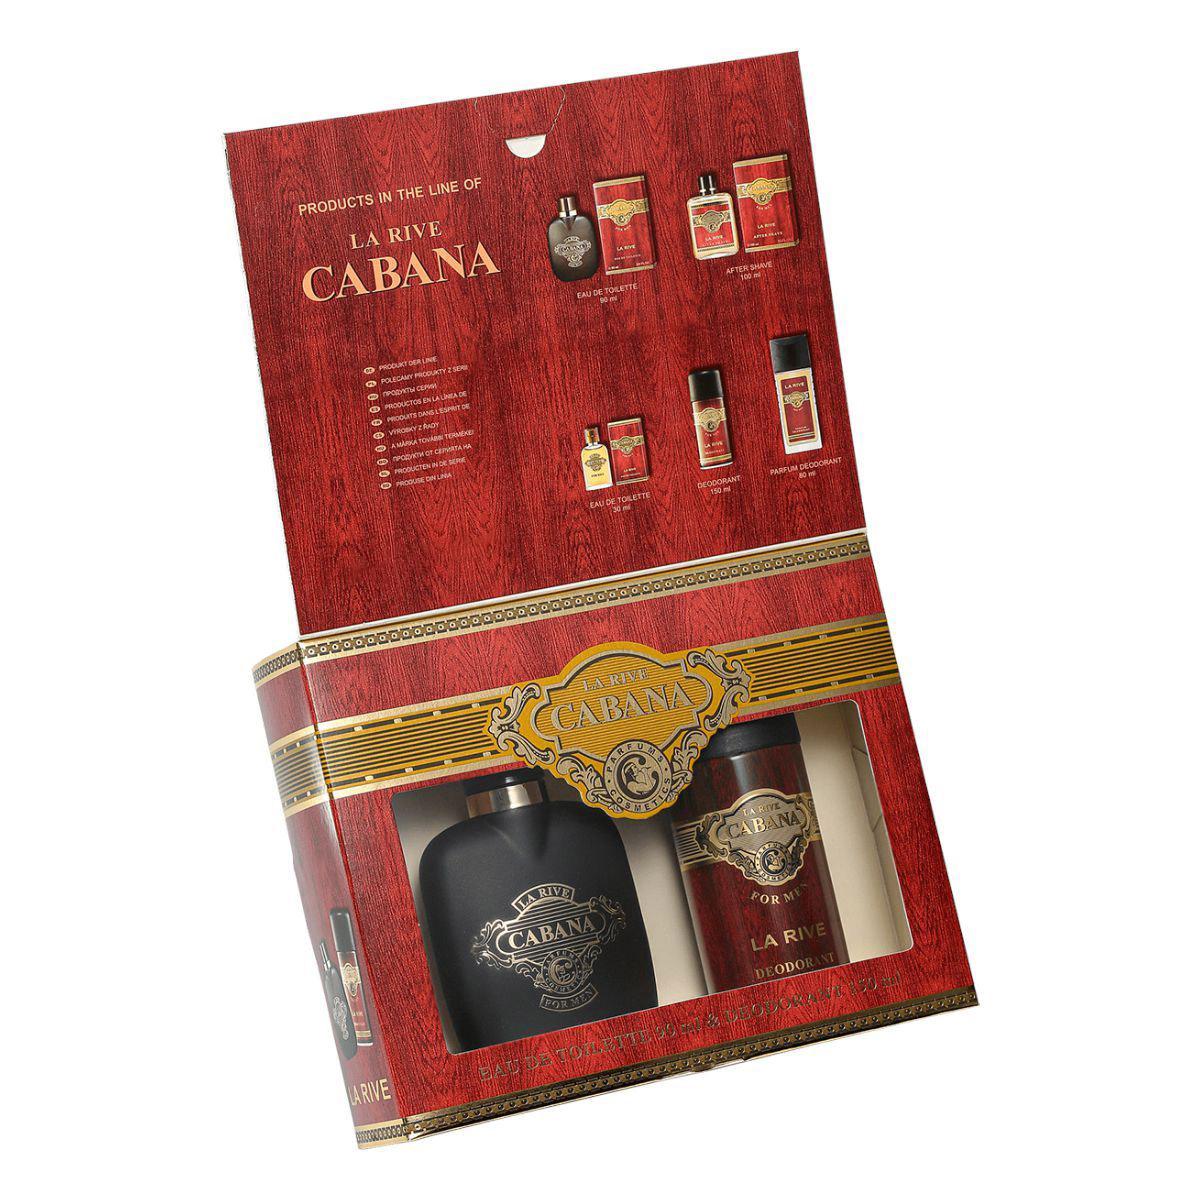 Kit Perfume Cabana 90ml + Desodorante 150ml La Rive